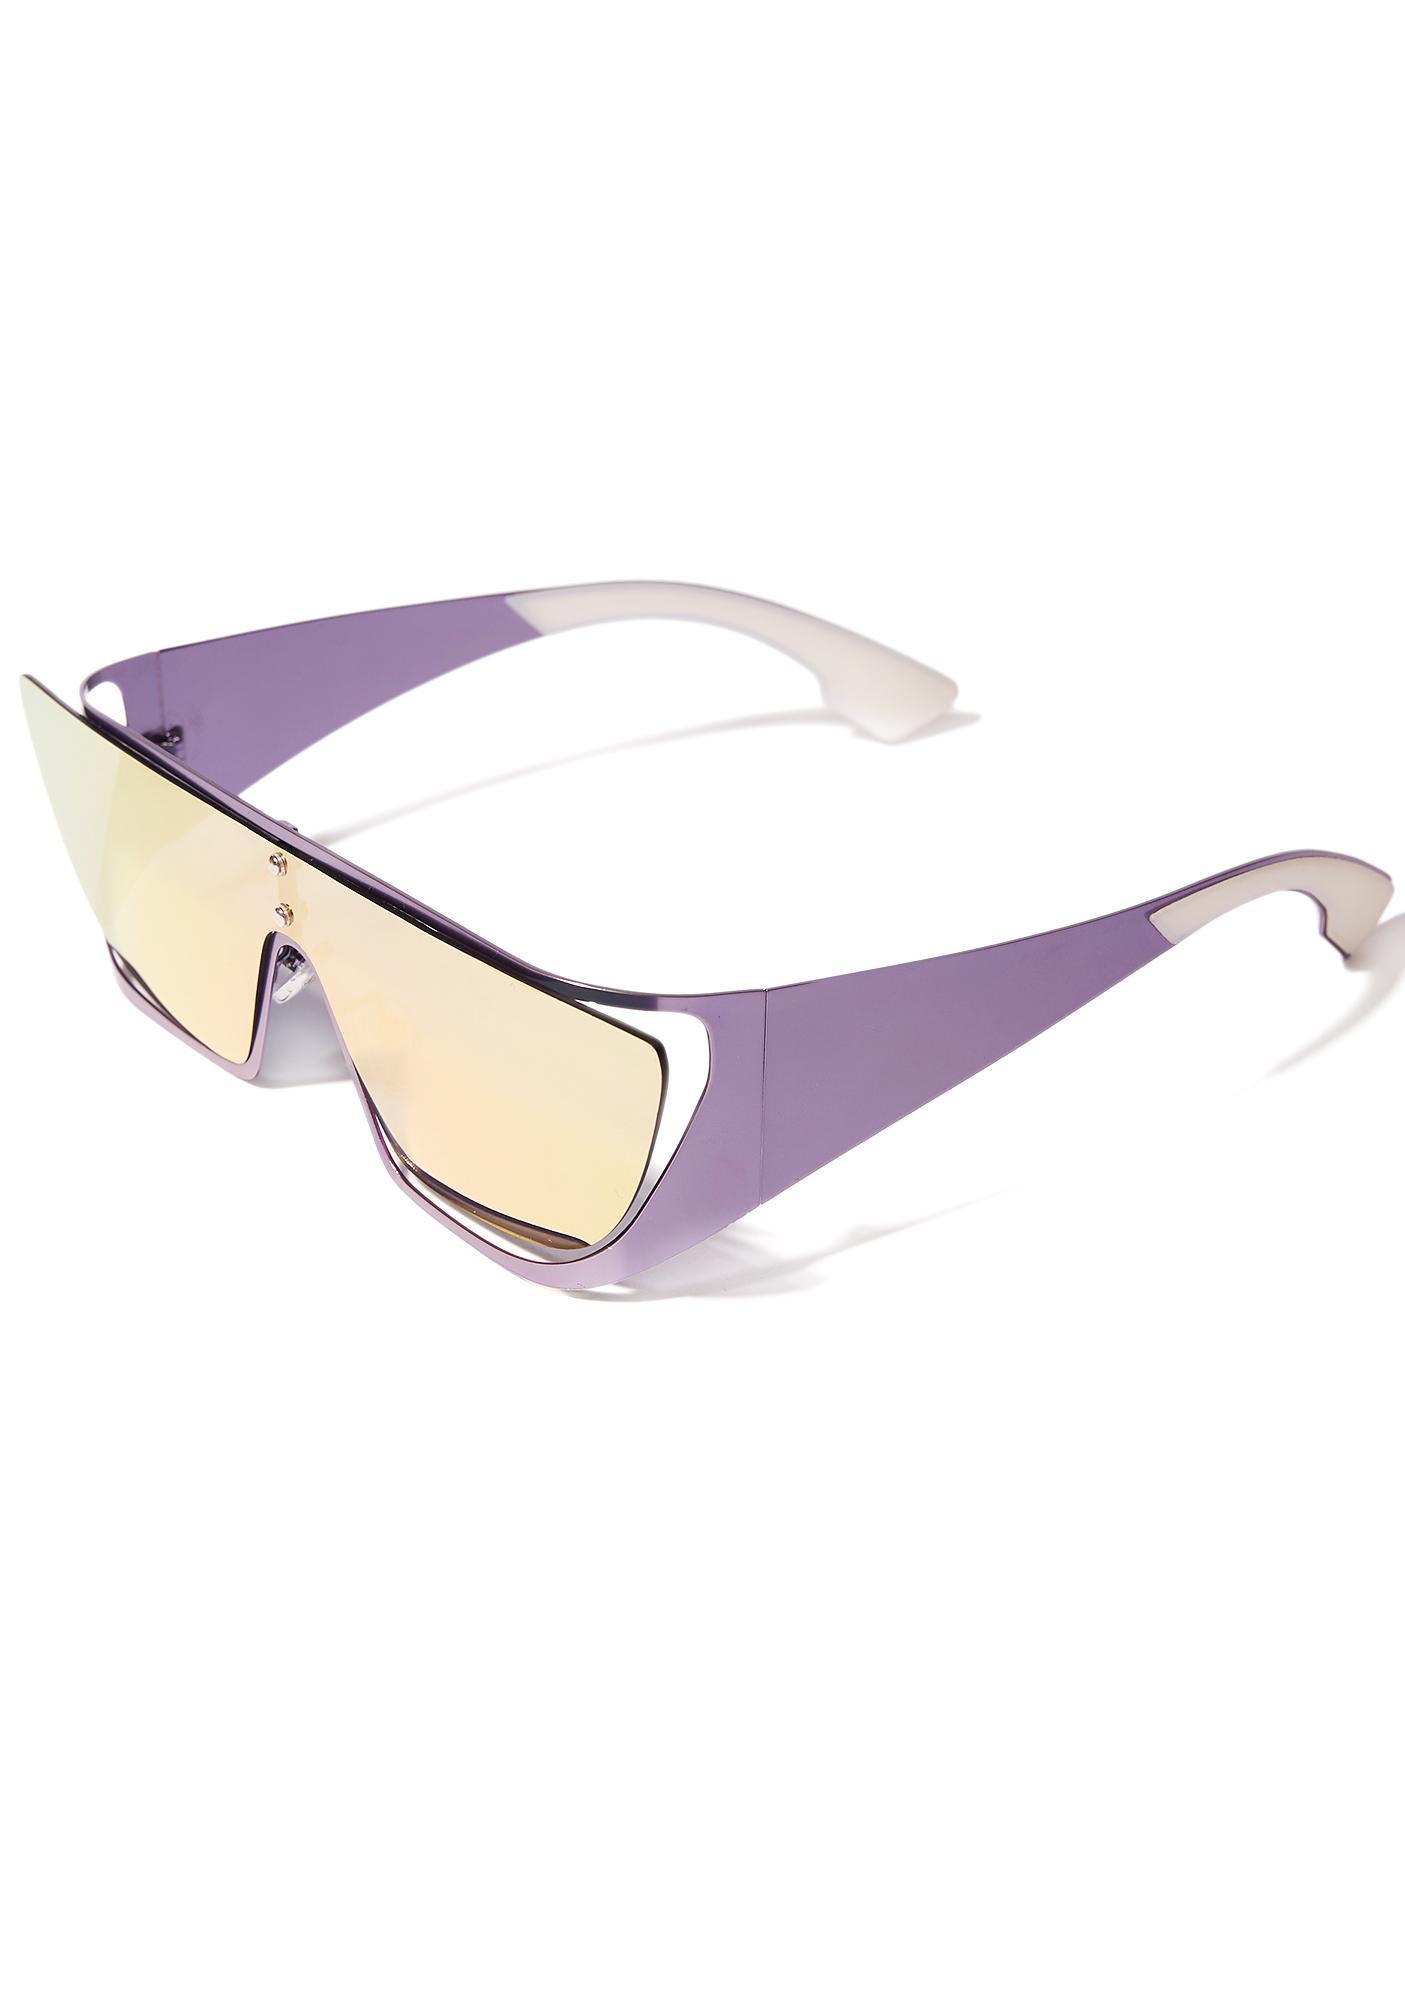 f0205d3a6fea ... Rad and Refined Purple Hazed Terminator Sunglasses